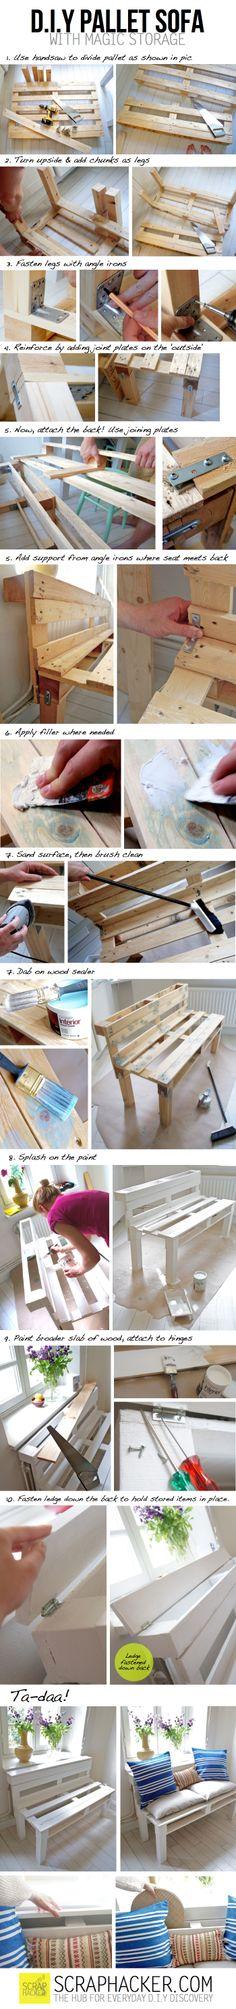 DIY : Pallet Sofa - Recyclart